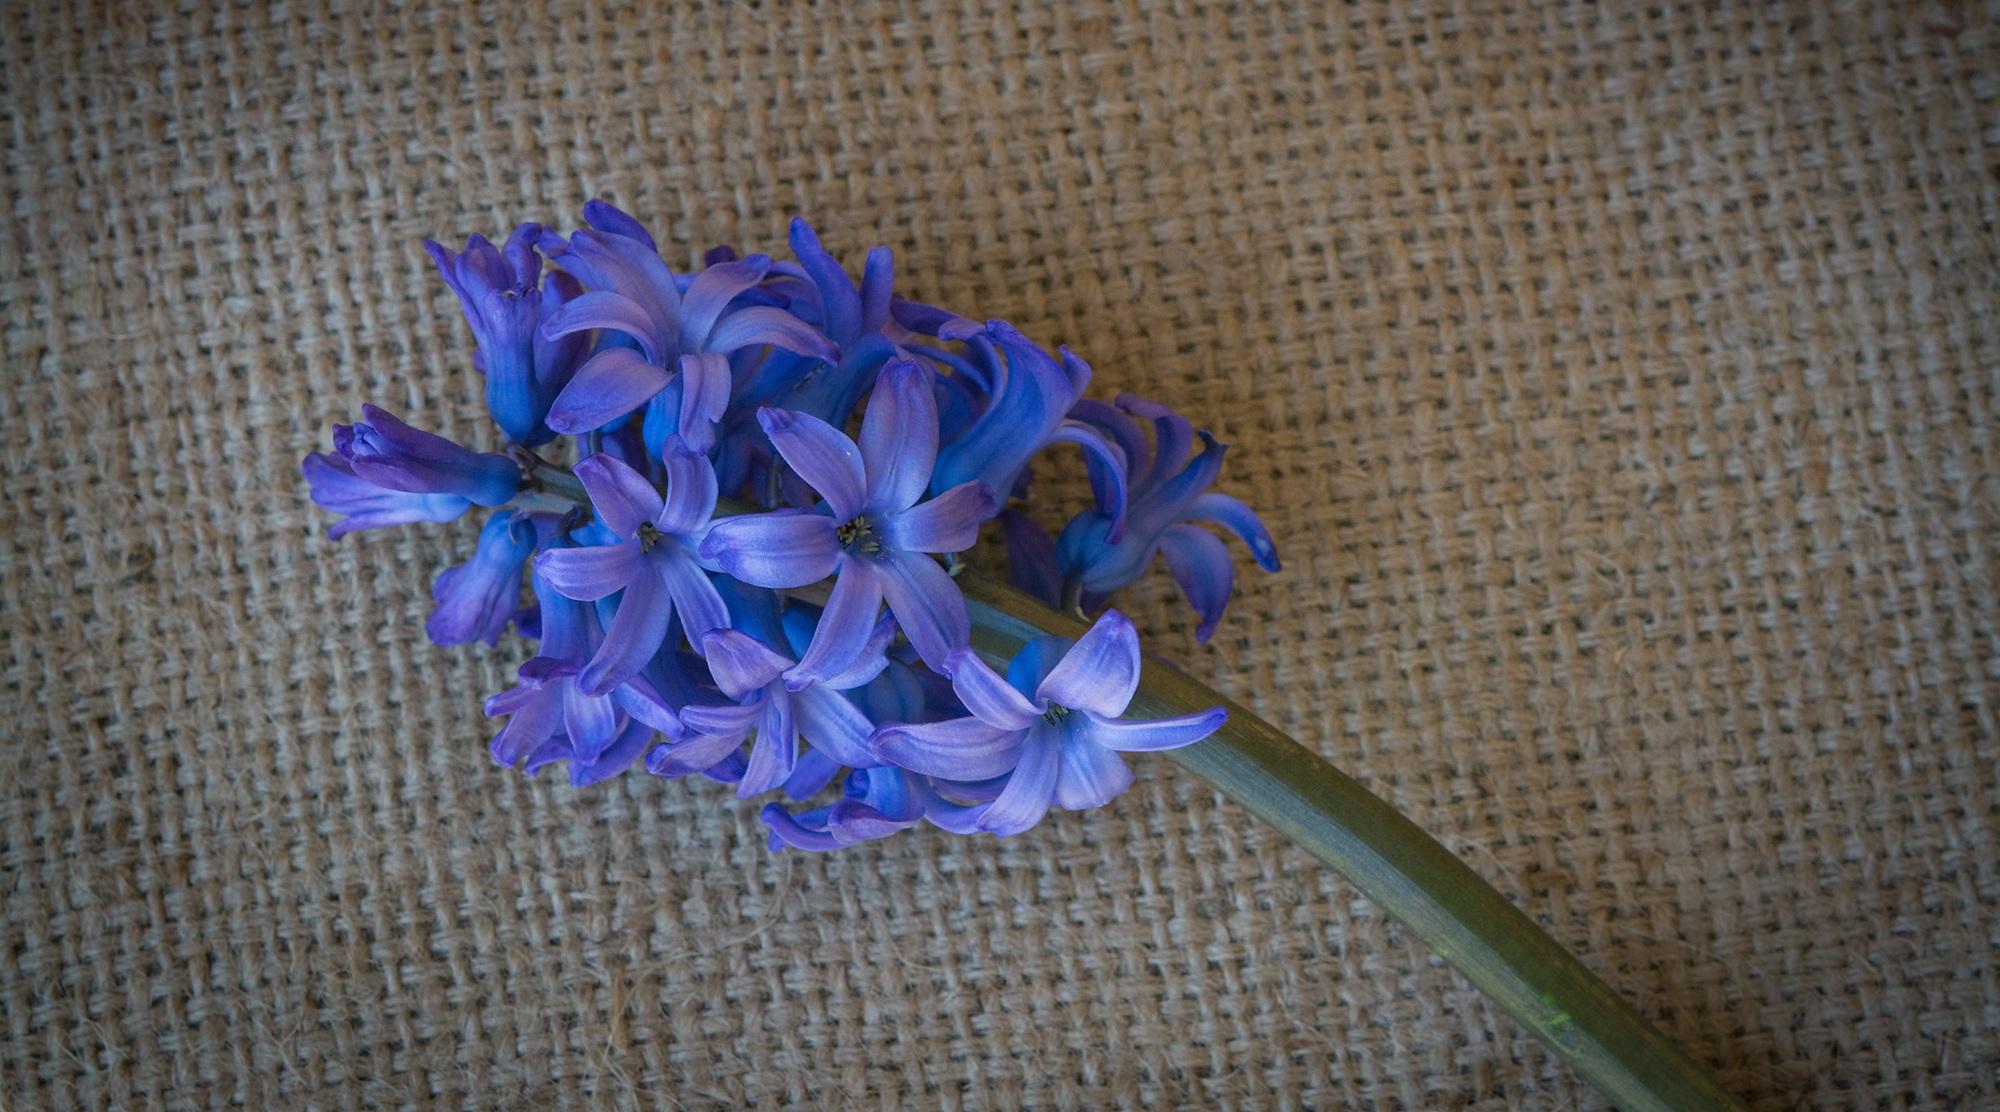 Free images wheel purple petal close blue flower art plant wheel flower purple petal blue close blue flower flowers art fragrant hyacinth spring flower blue mightylinksfo